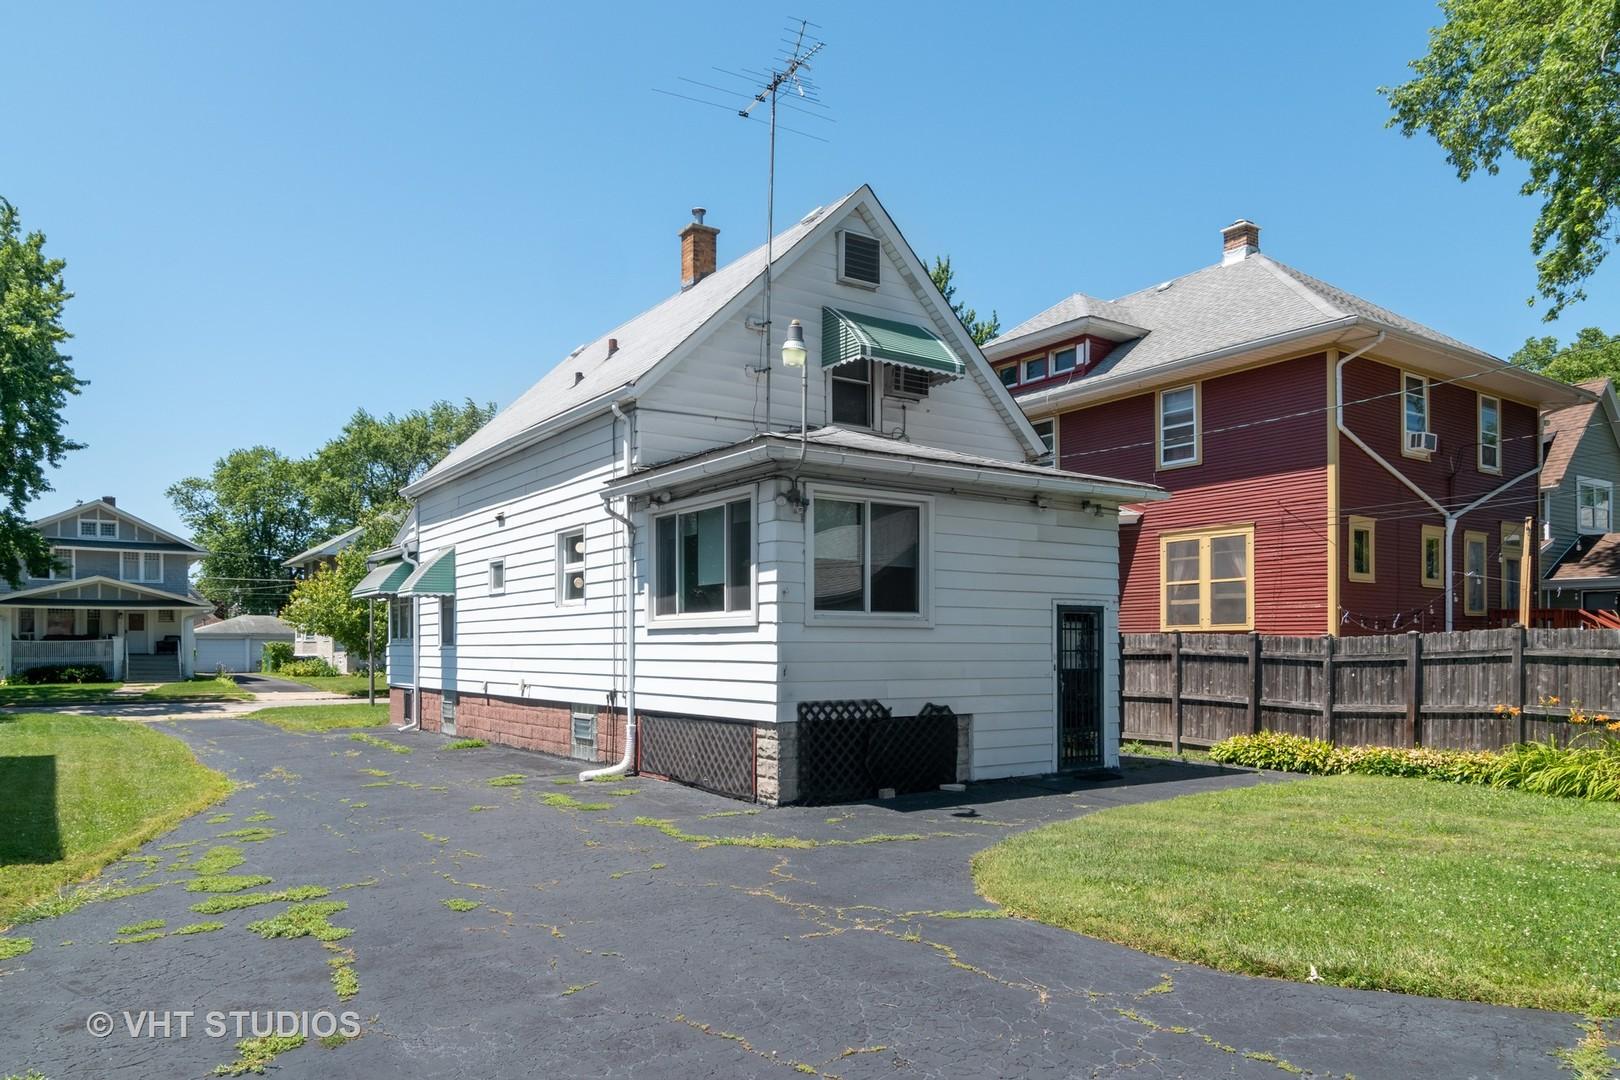 513 North 3rd, Maywood, Illinois, 60153